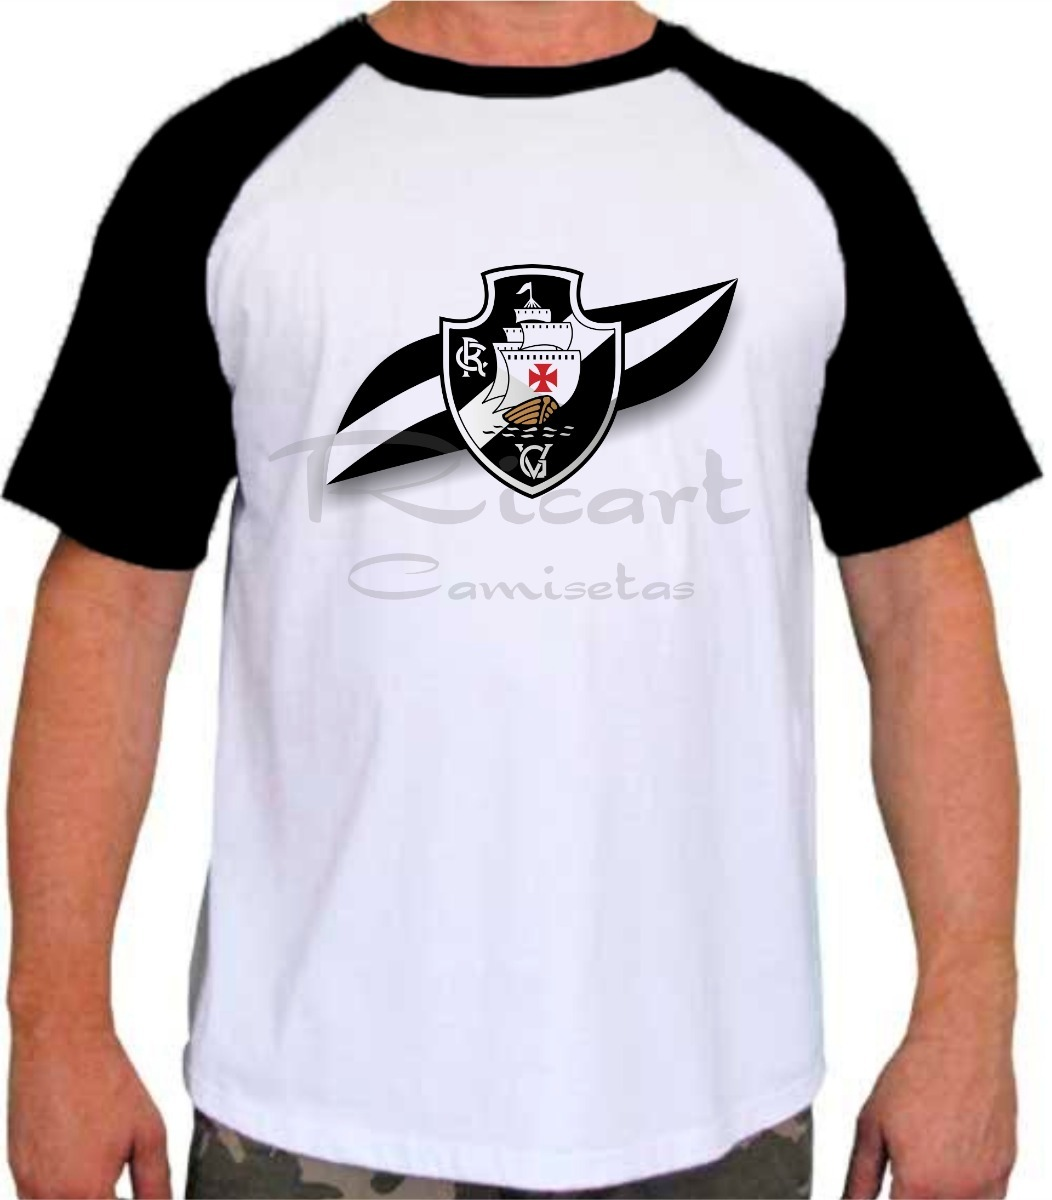 e23979b09b393 Camiseta Raglan Vasco Da Gama Time Futebol Escudo - R  34